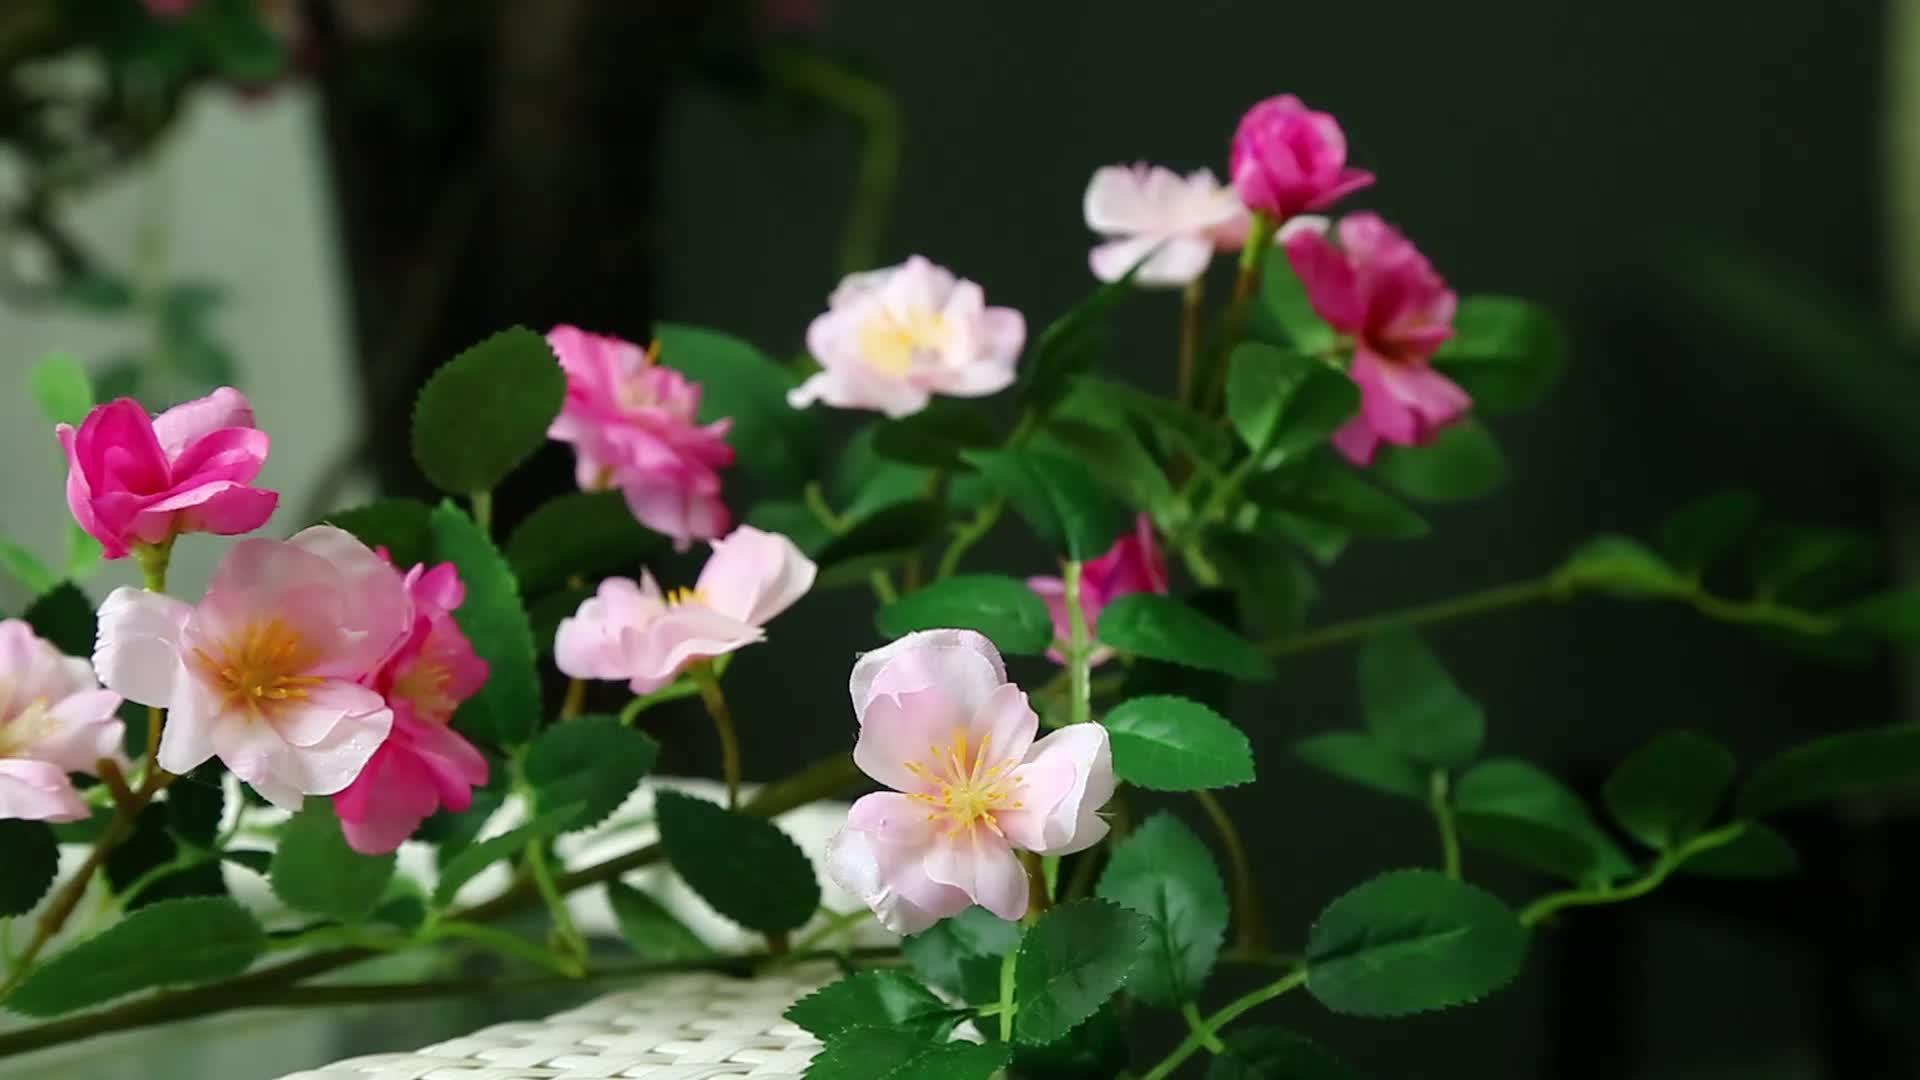 roses flannel peony rose leaf flower desert rose plants for sale flower vine garland artificial flowers peony